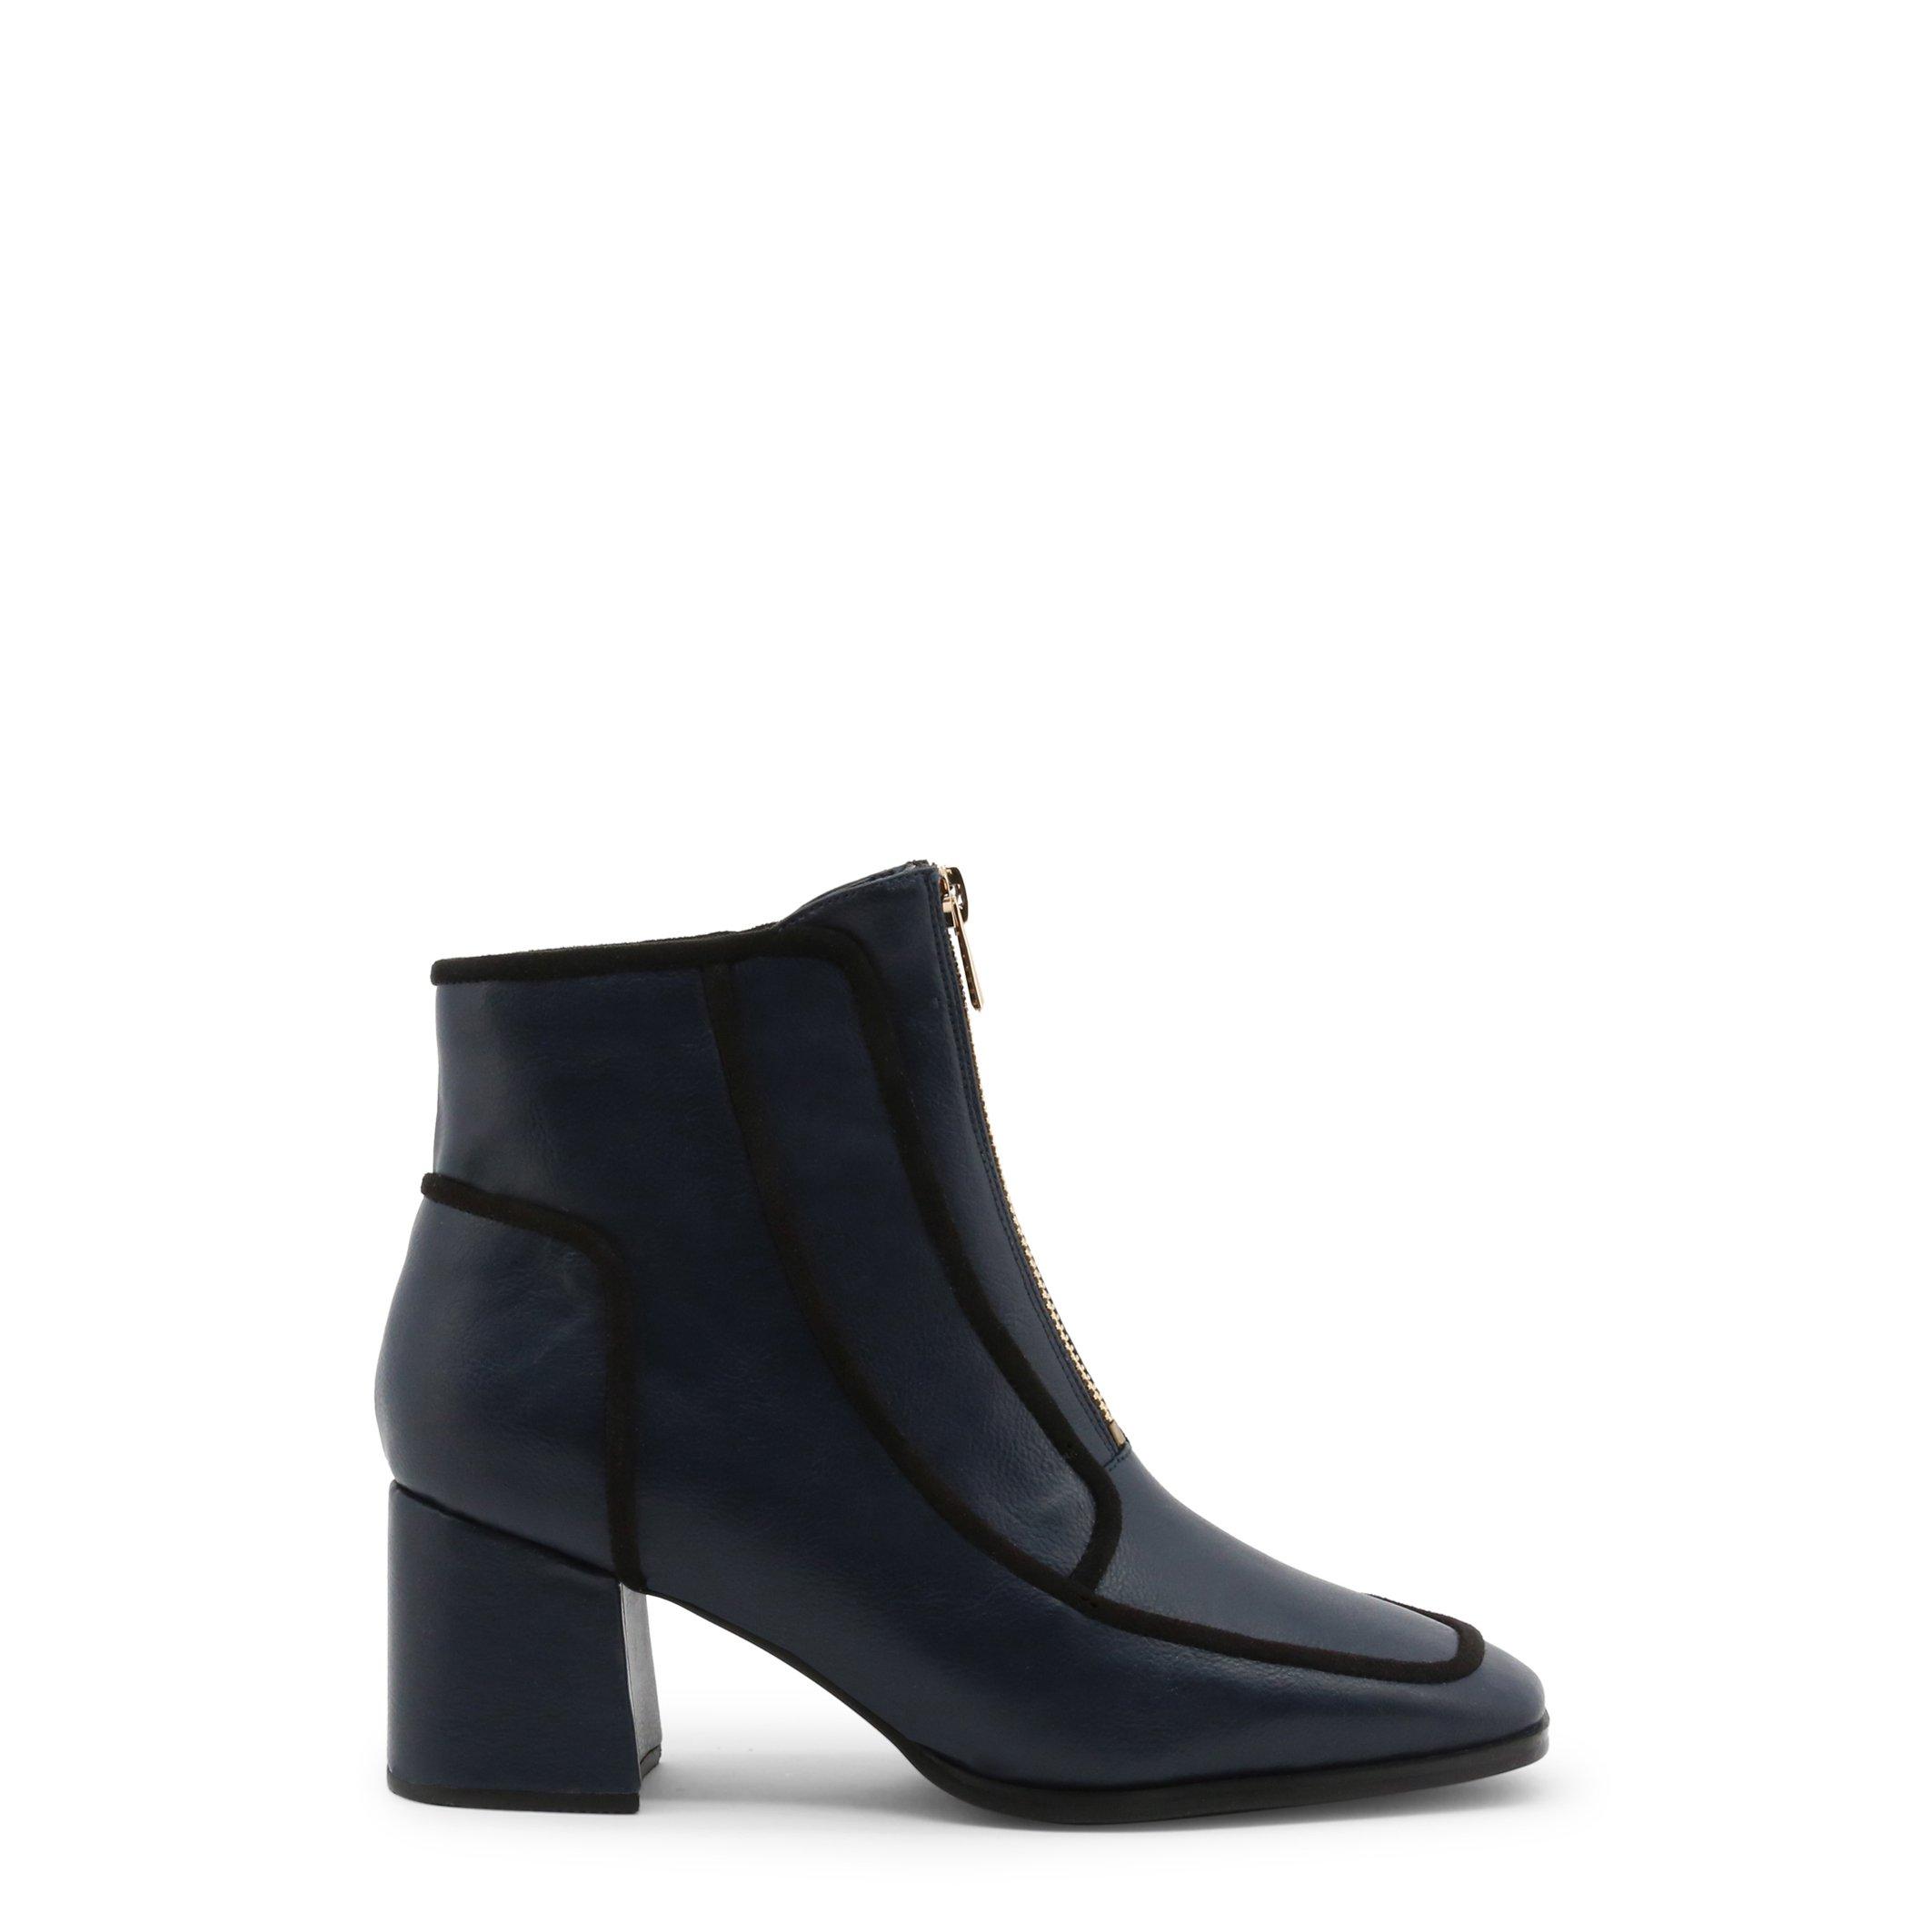 Roccobarocco Women's Ankle Boots Black 342953 - blue EU 37